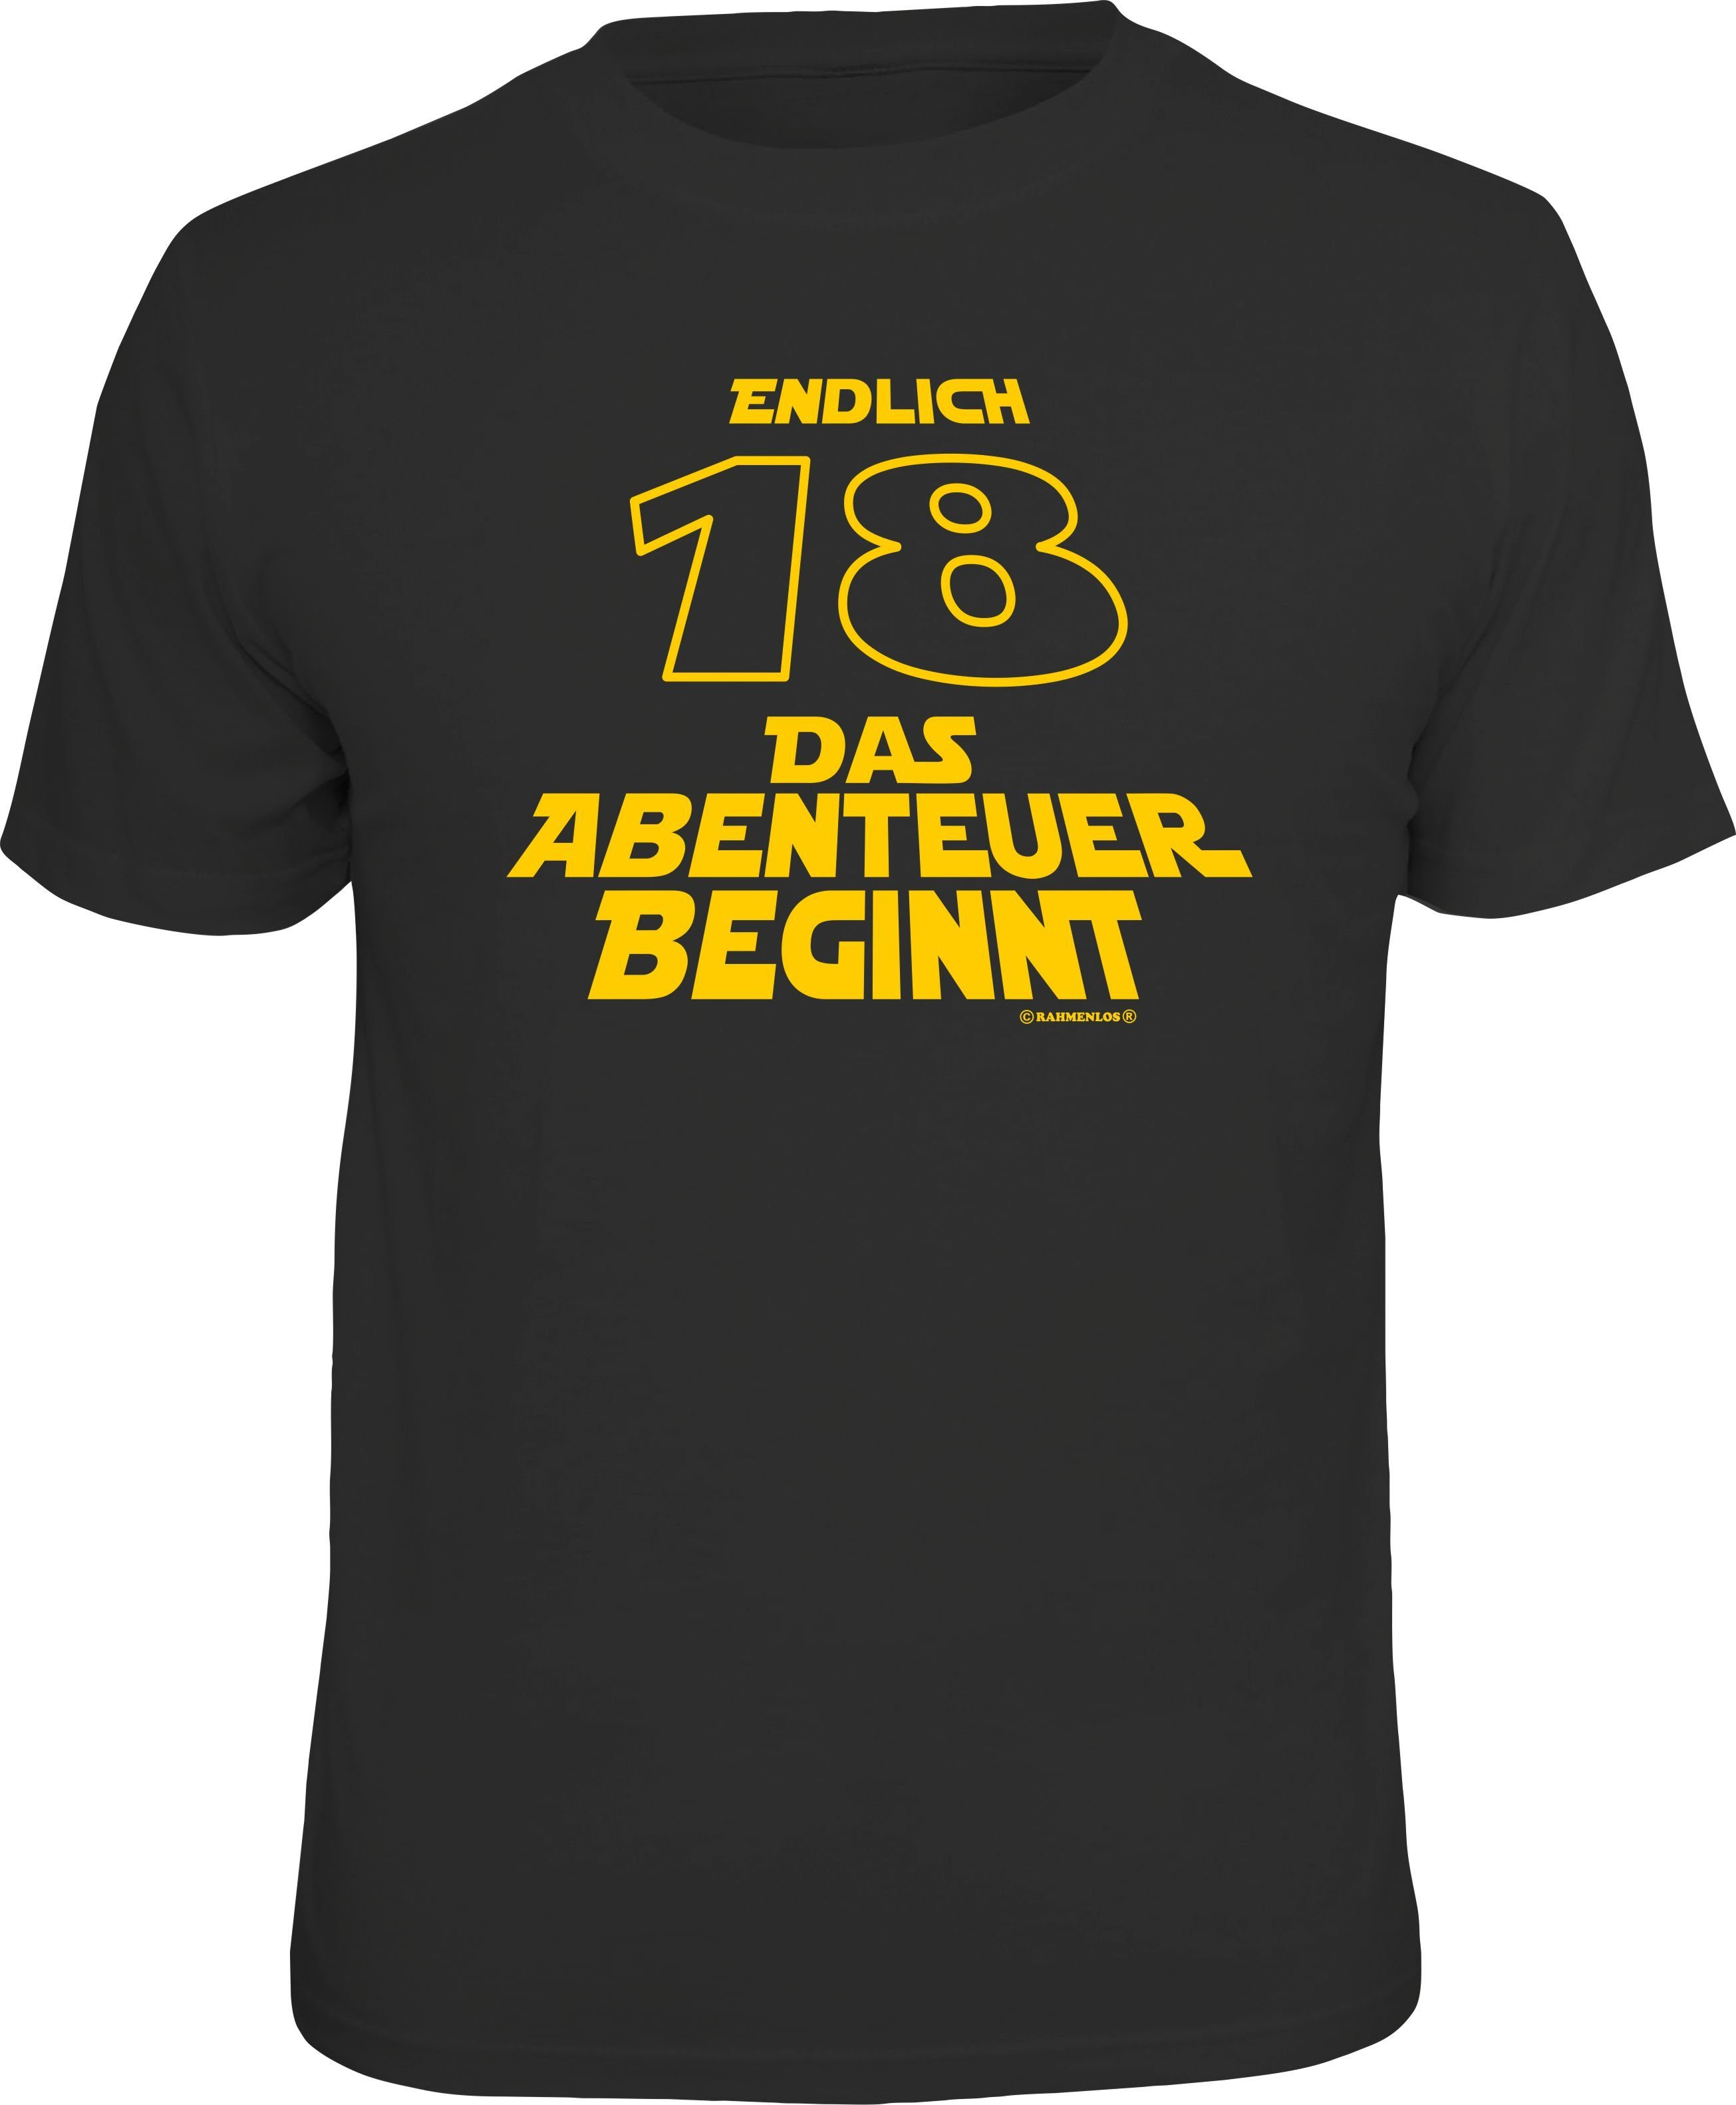 Rahmenlos T-Shirt zum 18. Geburtstag